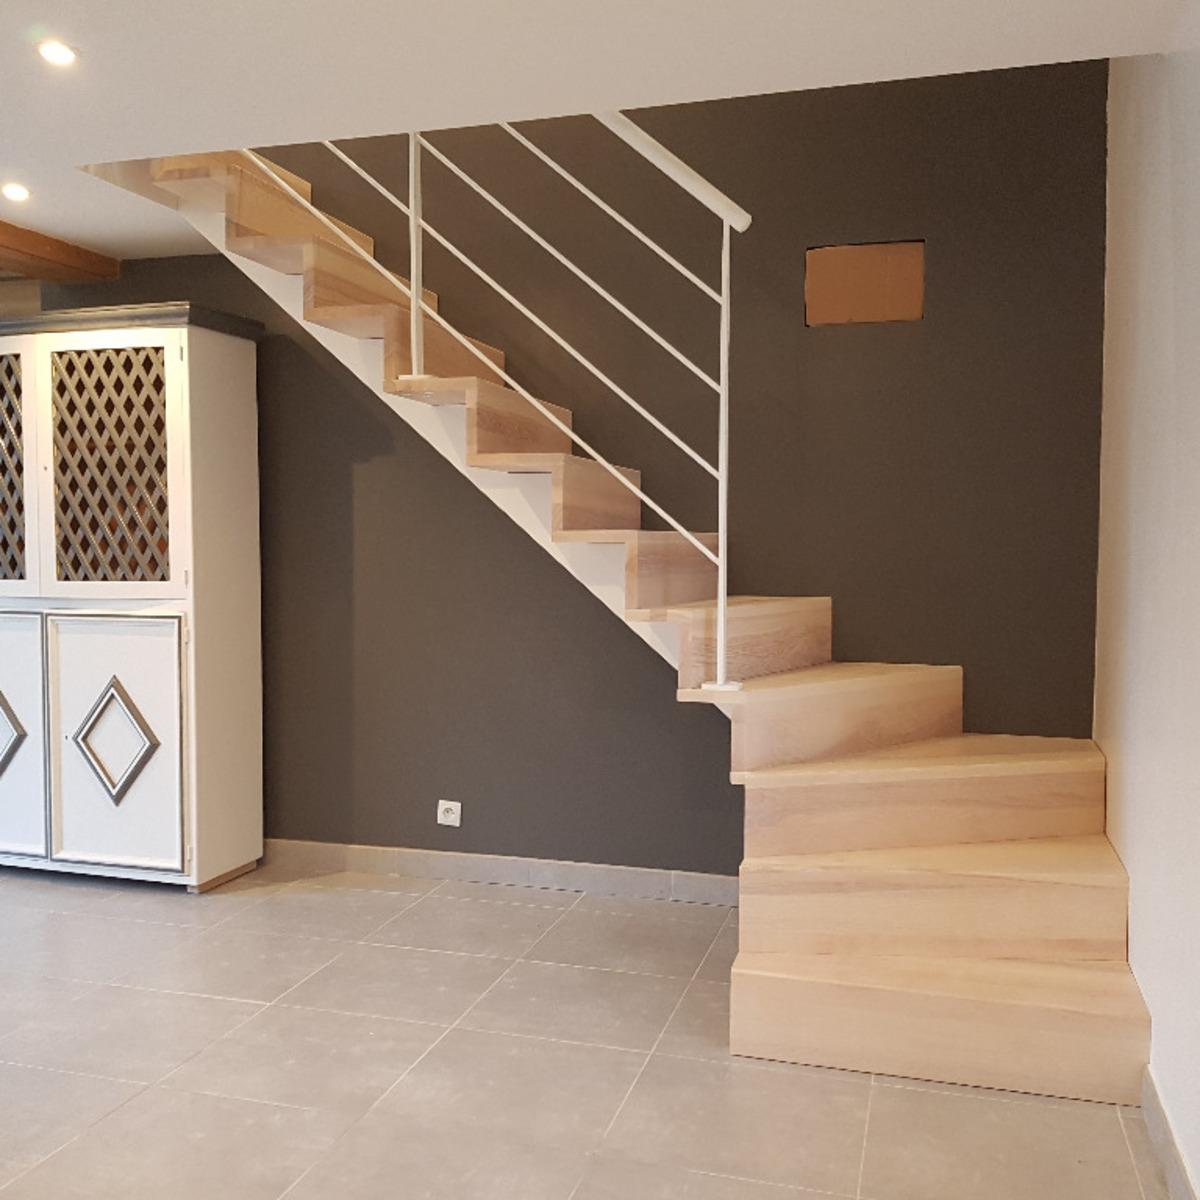 Où acheter un escalier sur mesure ?